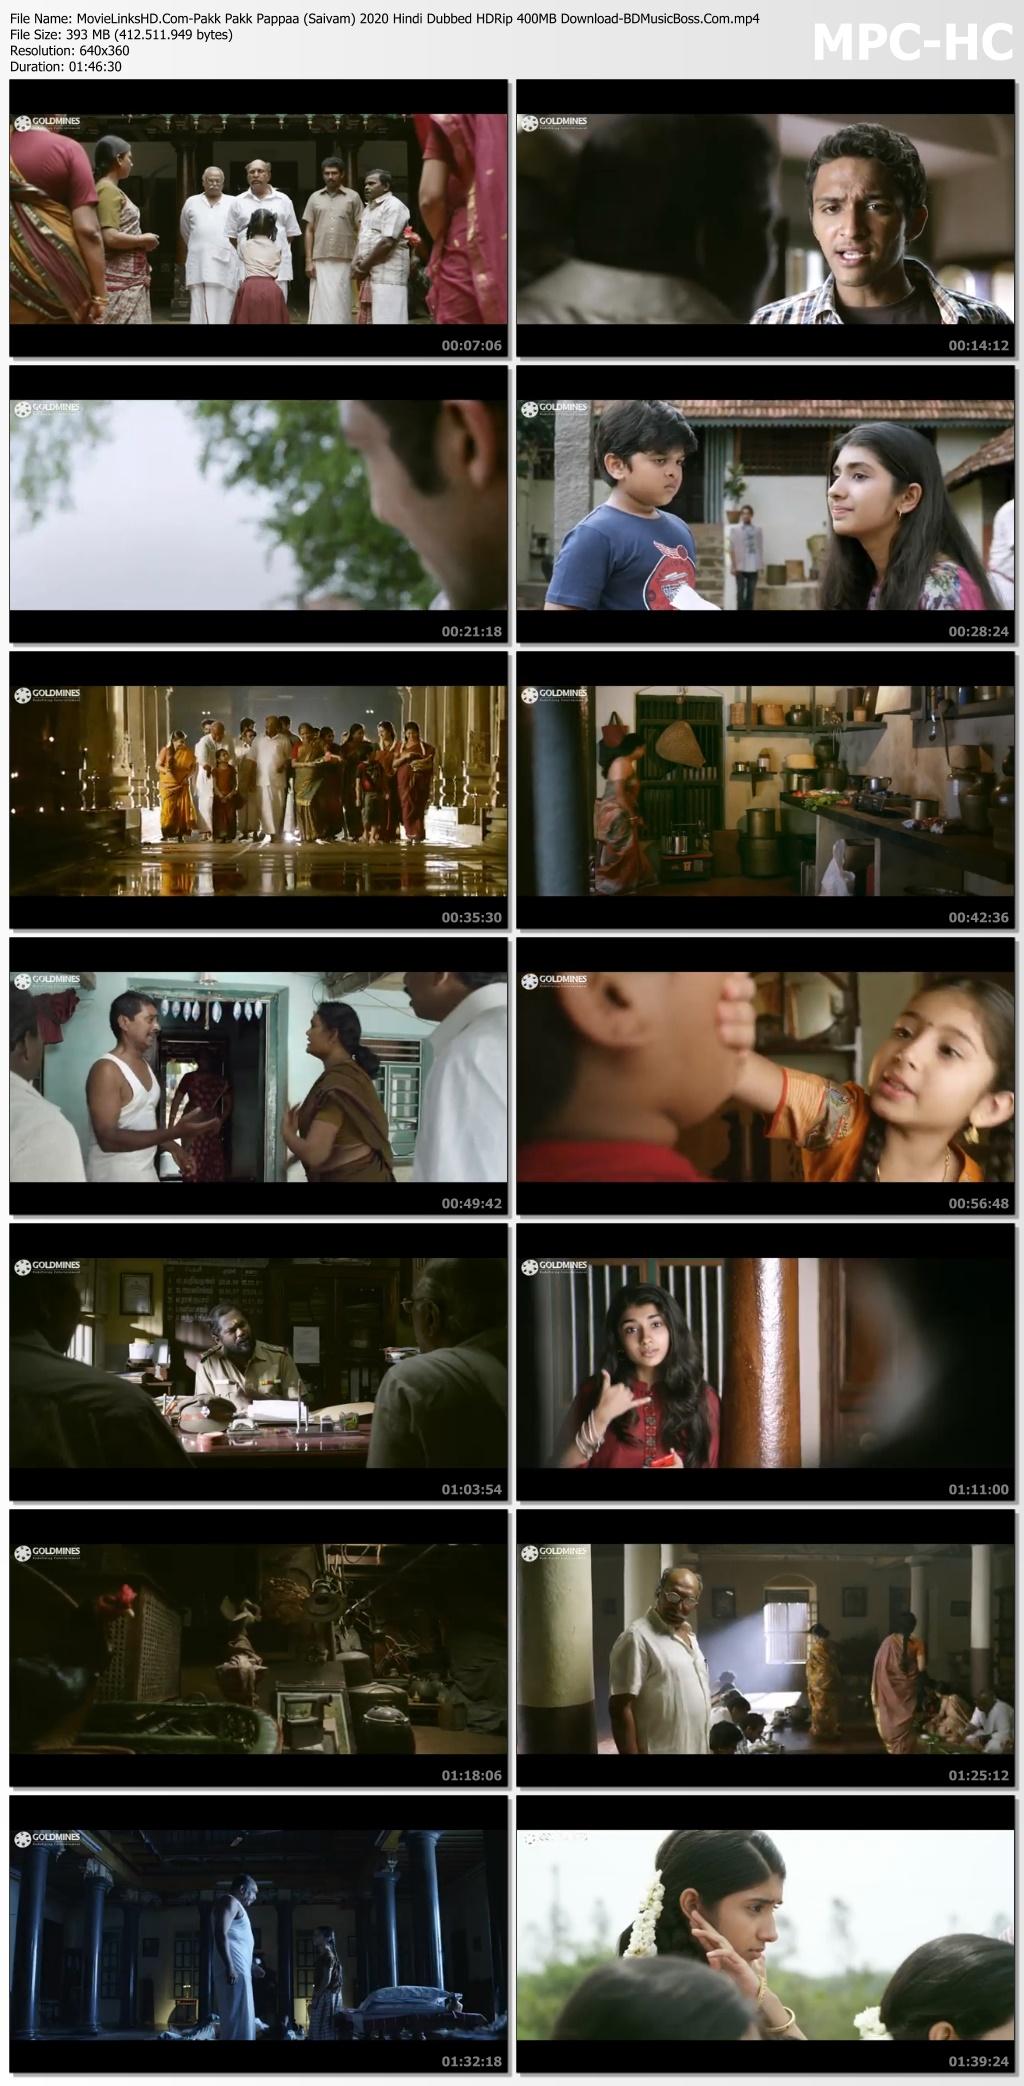 Movie-Links-HD-Com-Pakk-Pakk-Pappaa-Saivam-2020-Hindi-Dubbed-HDRip-400-MB-Download-BDMusic-Boss-Com-